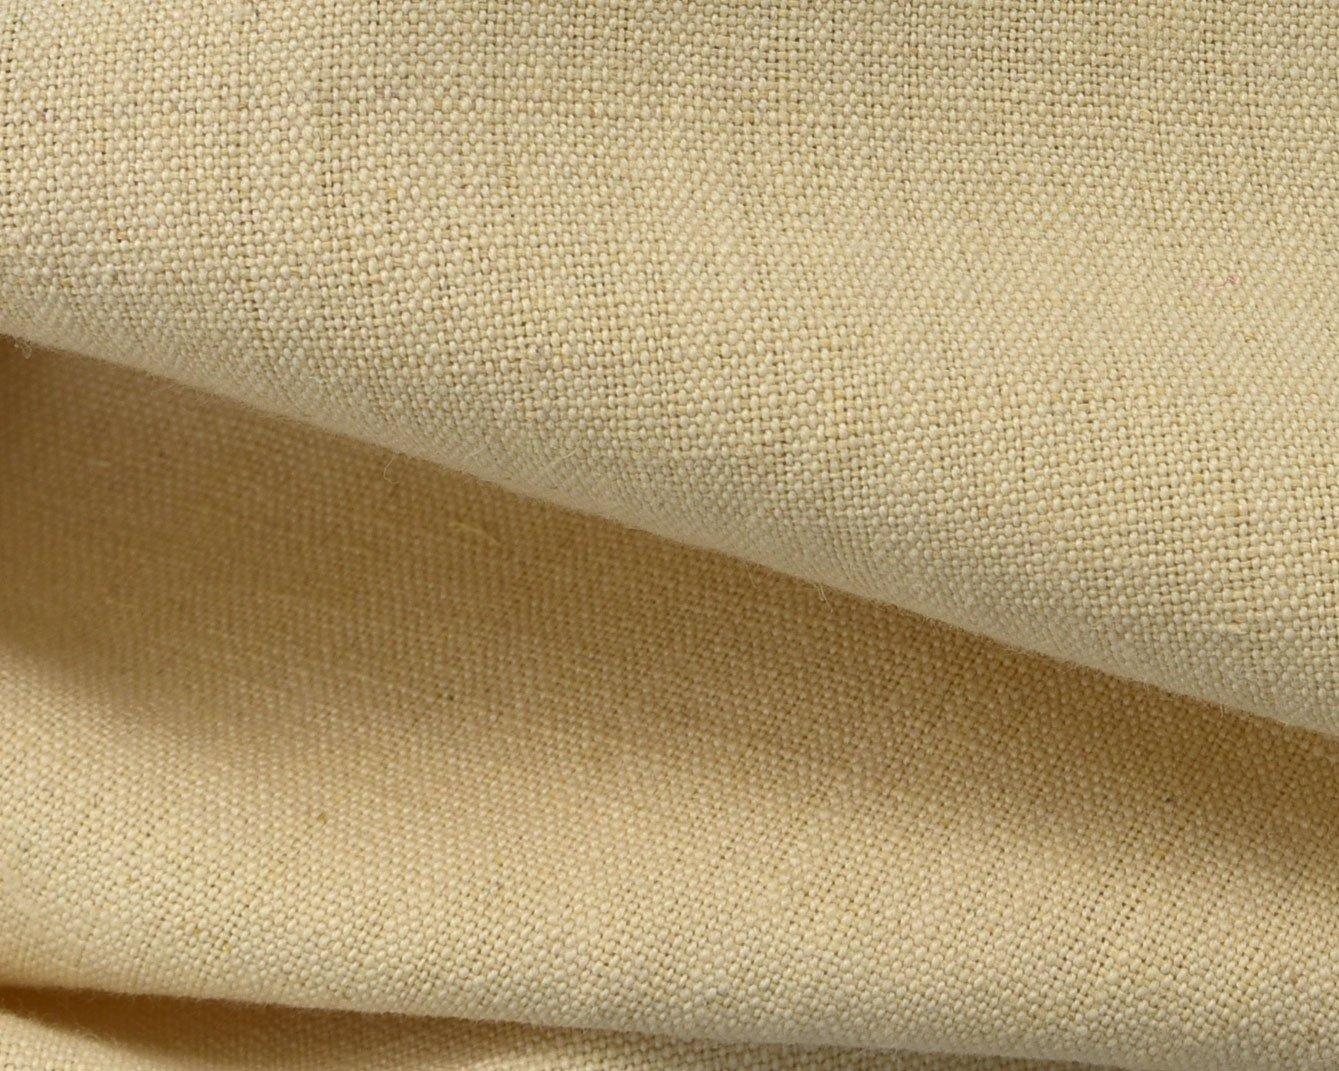 vintage hemp linen detail